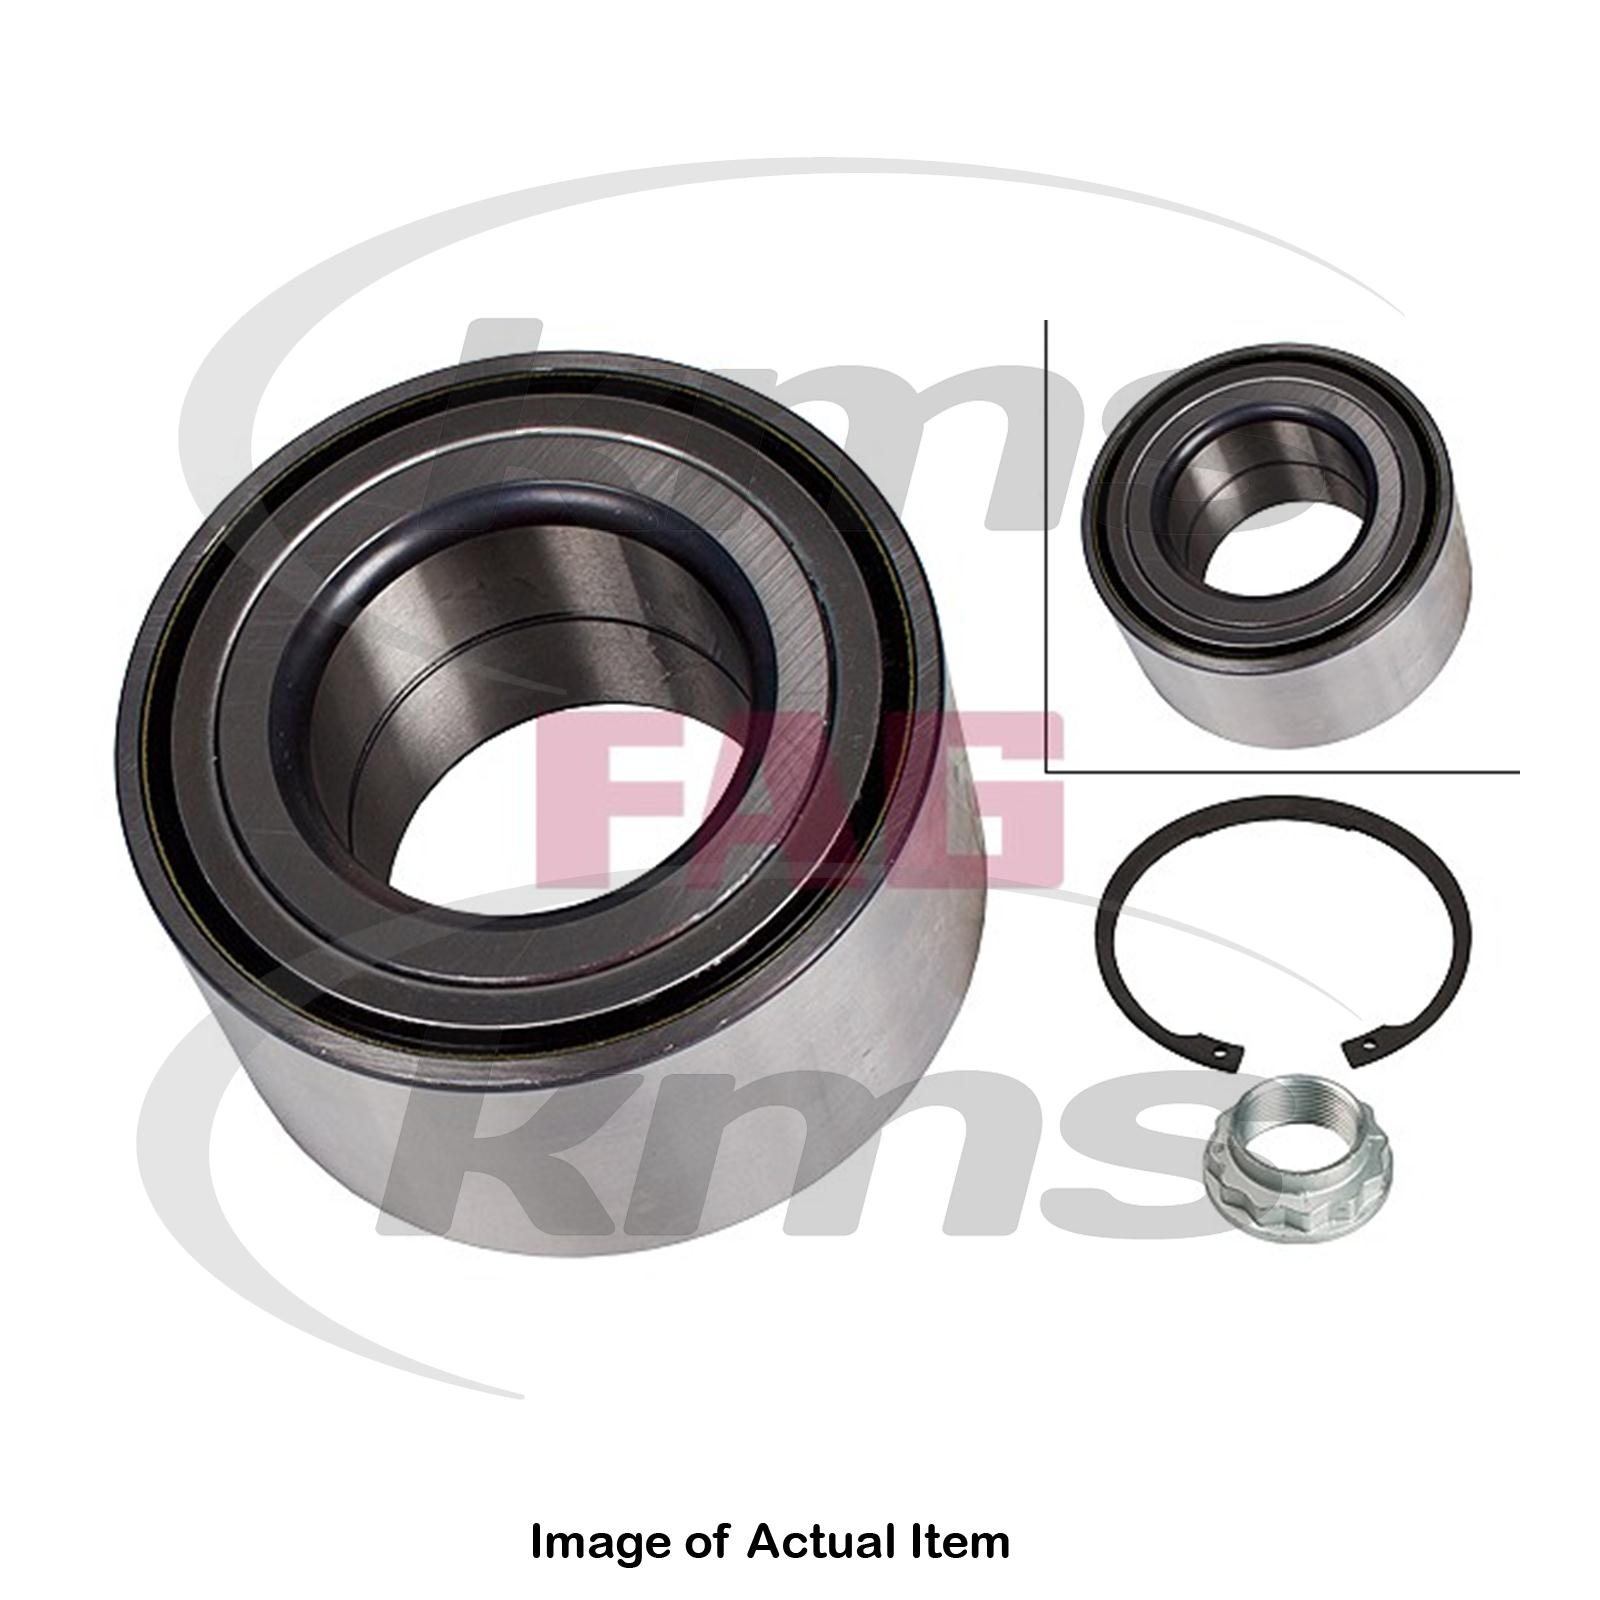 New Genuine FAG Wheel Bearing Kit 713 6493 00 Top German Quality